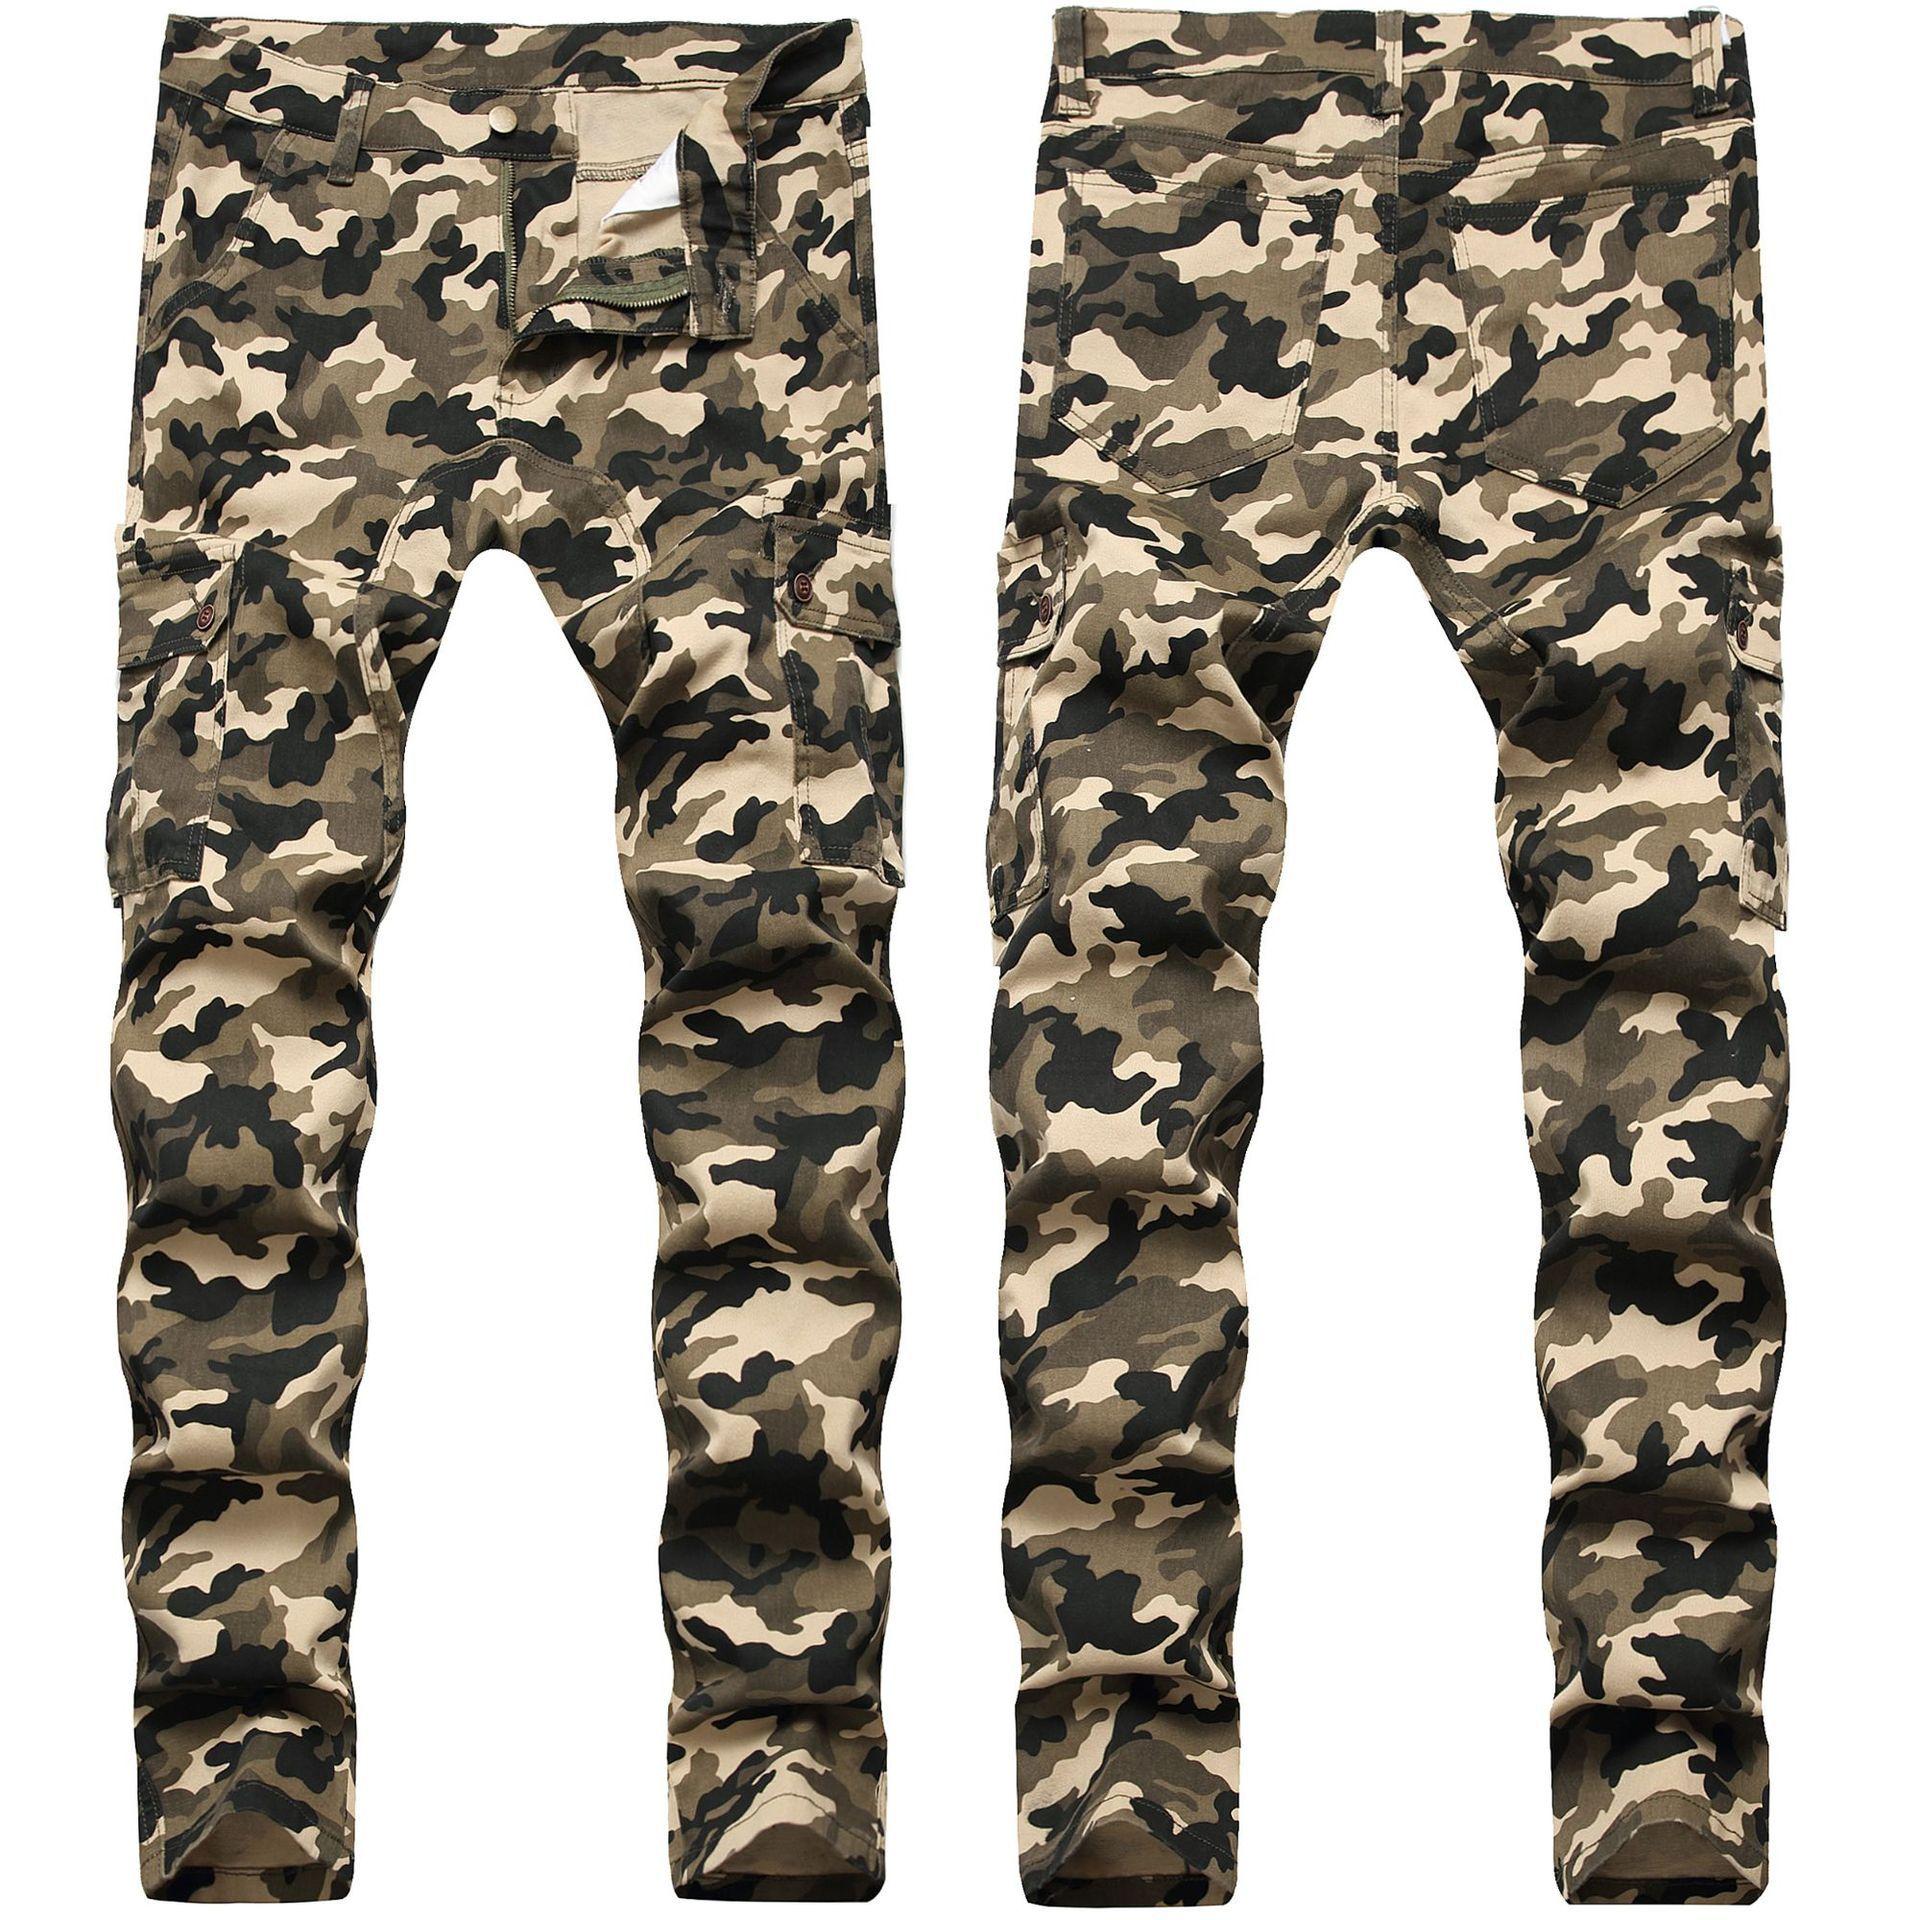 Sıska Erkek Camo Jeans Serin Erkekler Kot Streç Slim Fit Denim Biker Kot Hip Hop Erkekler Streetwear 755 #